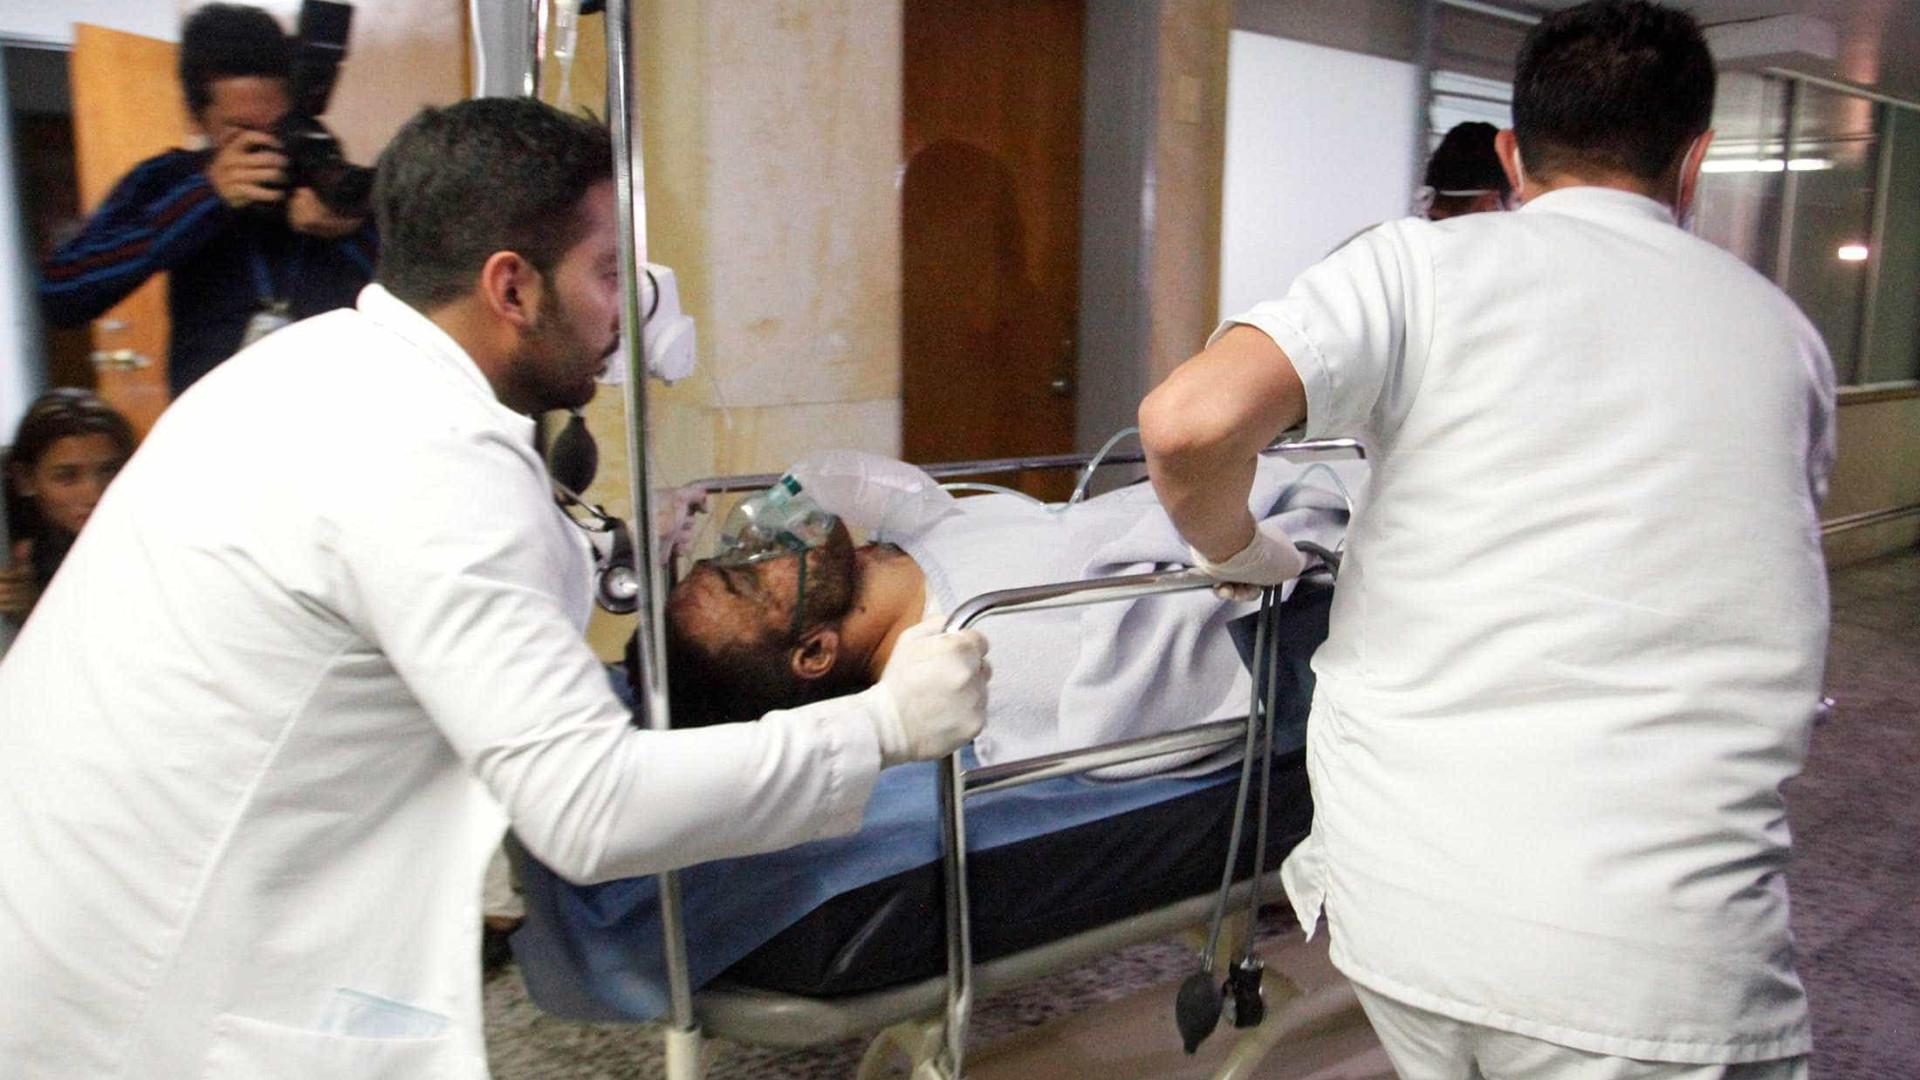 Conheça o estado clínico atual dos sobreviventes do voo da Chapecoense